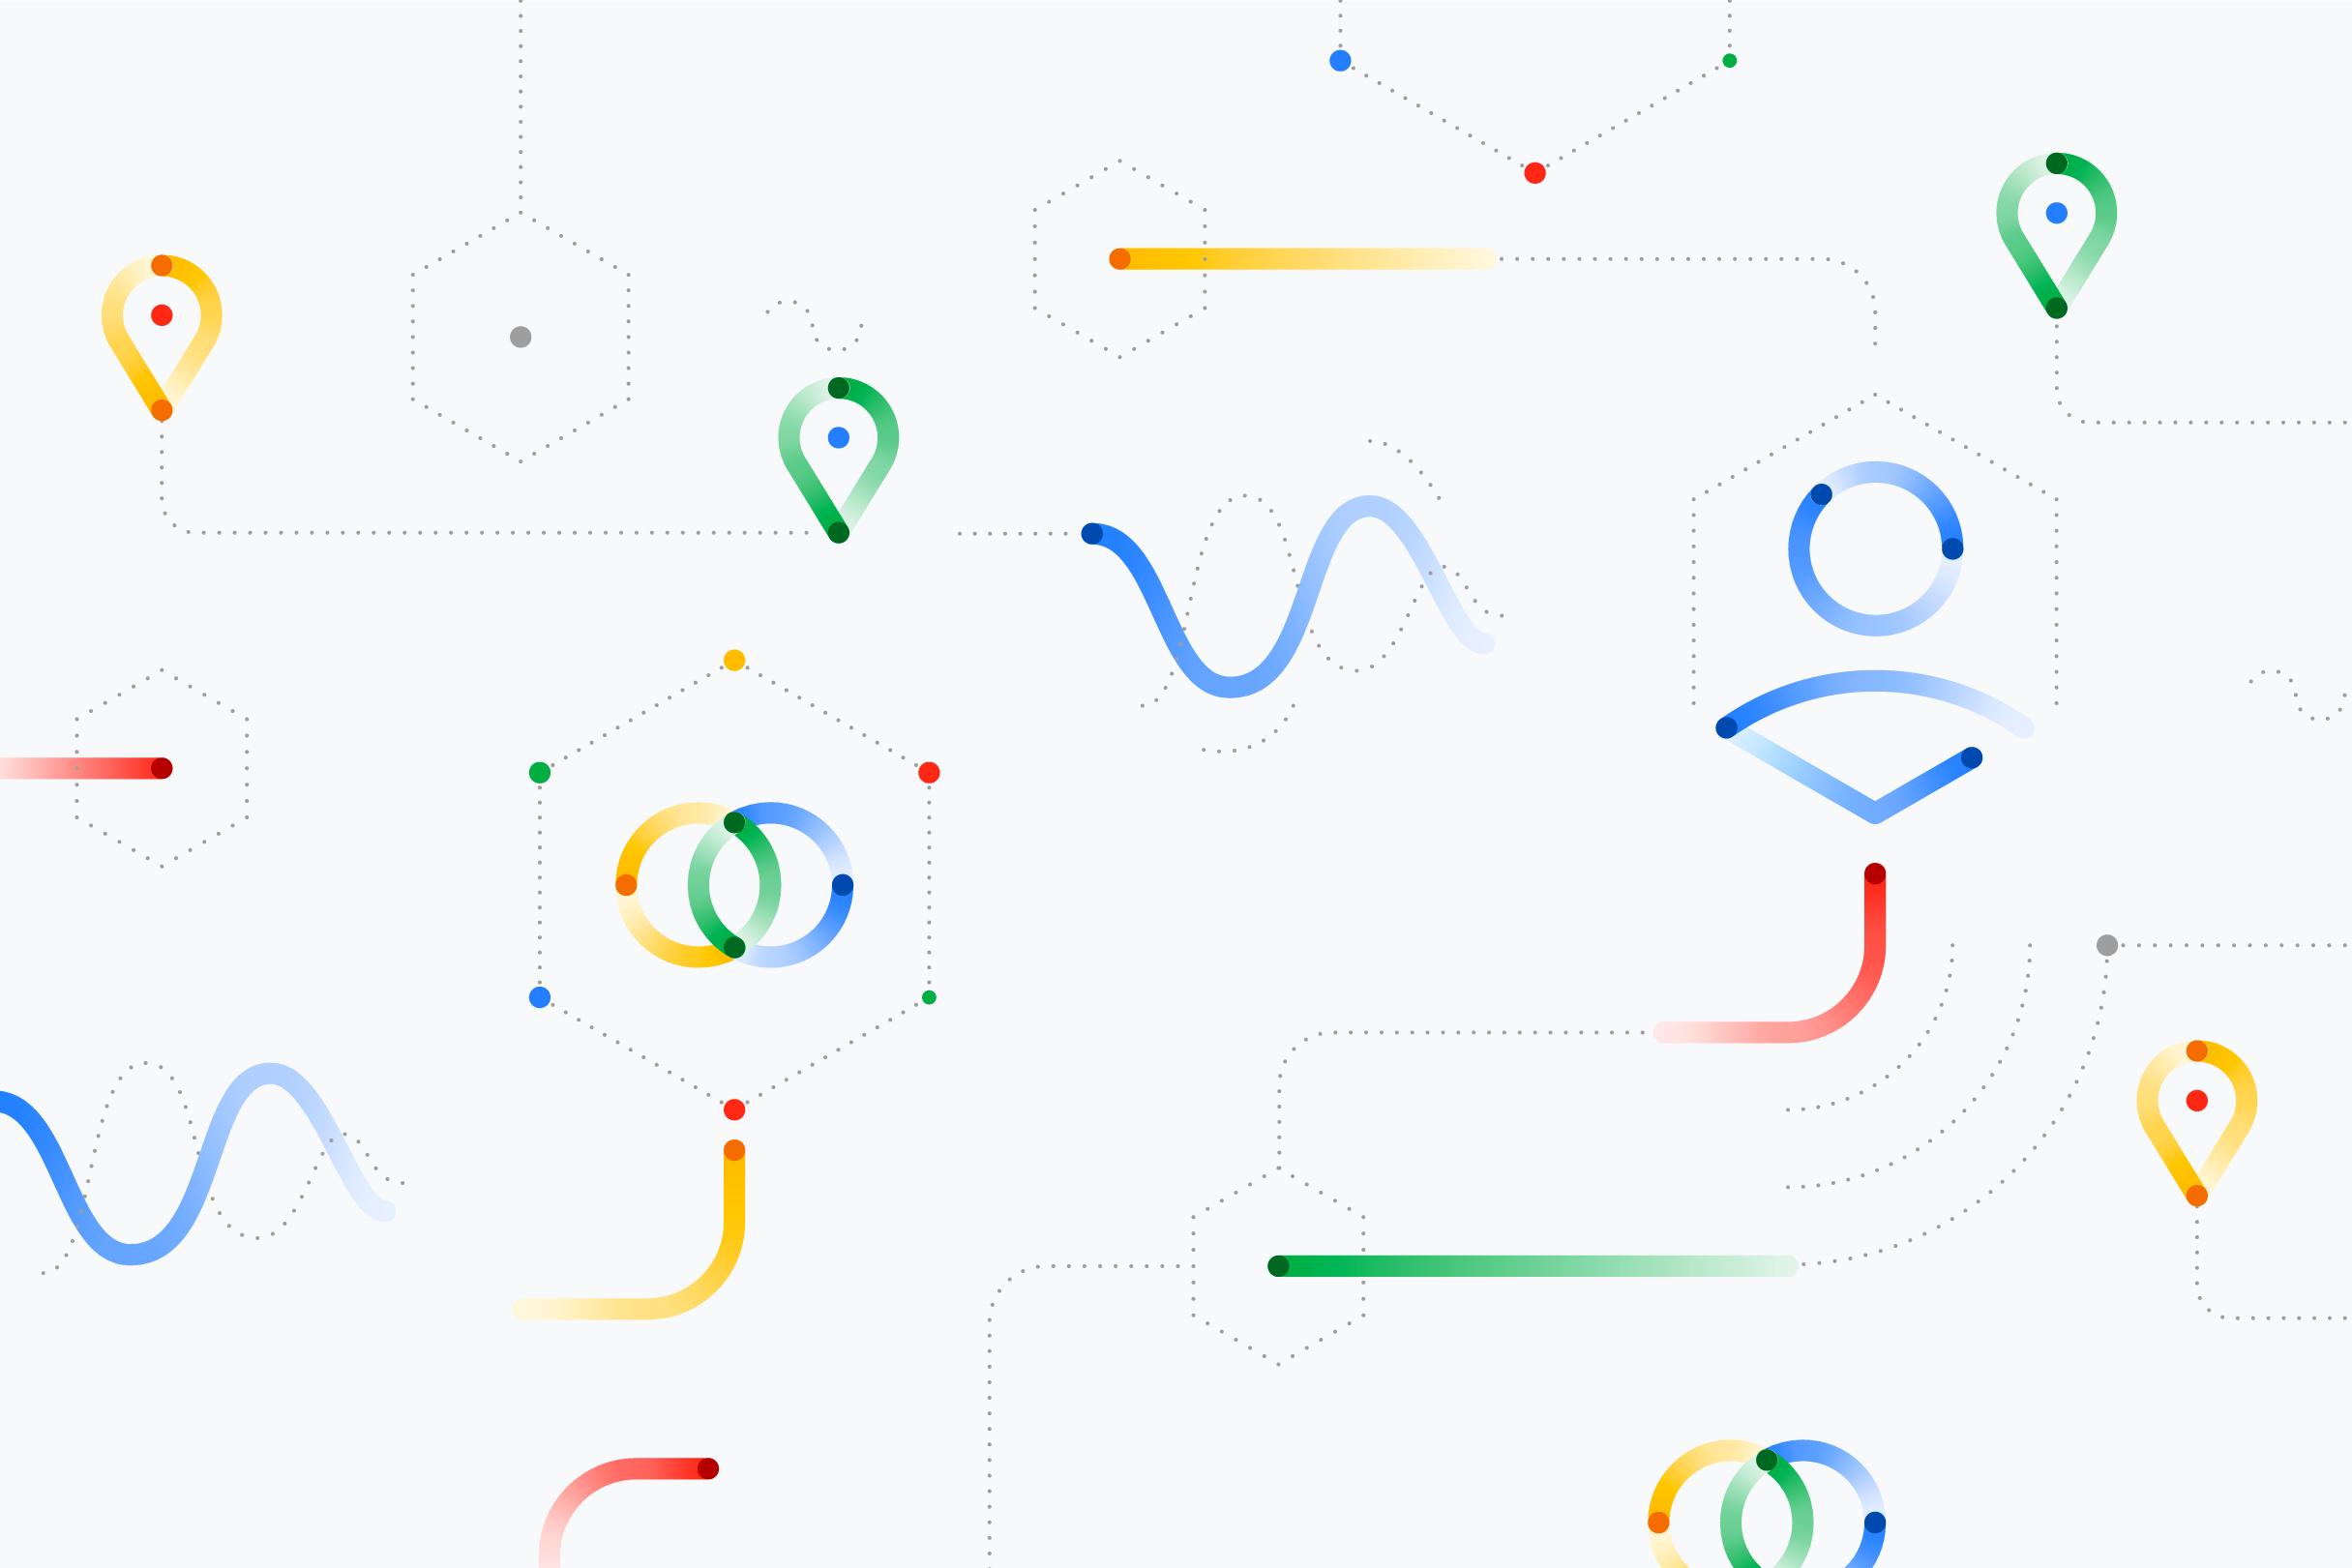 Google-AI-Launch-3x2.png